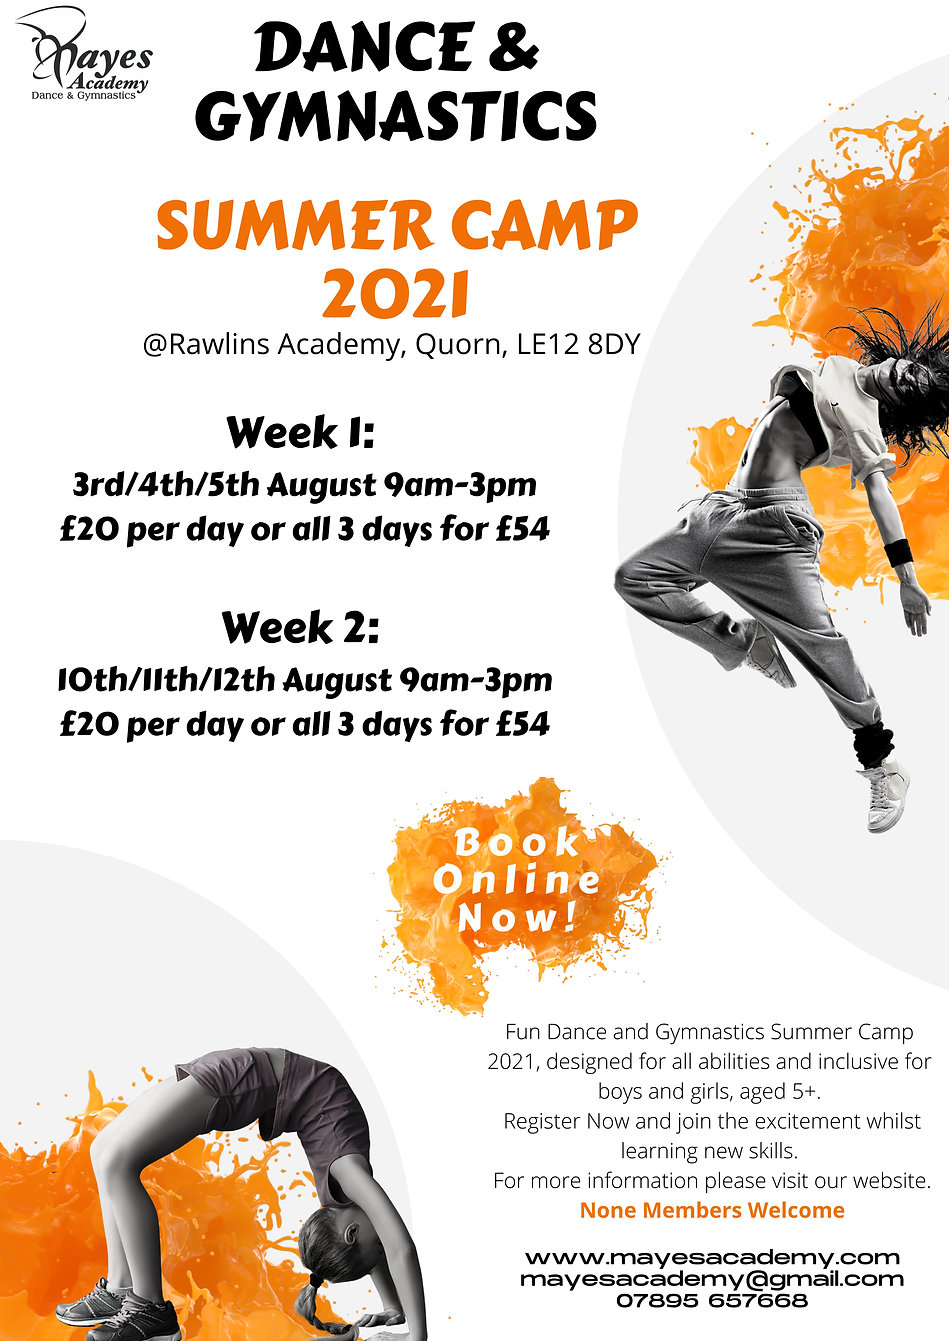 Summer Camp 2021 Dance & gymnastics (1).